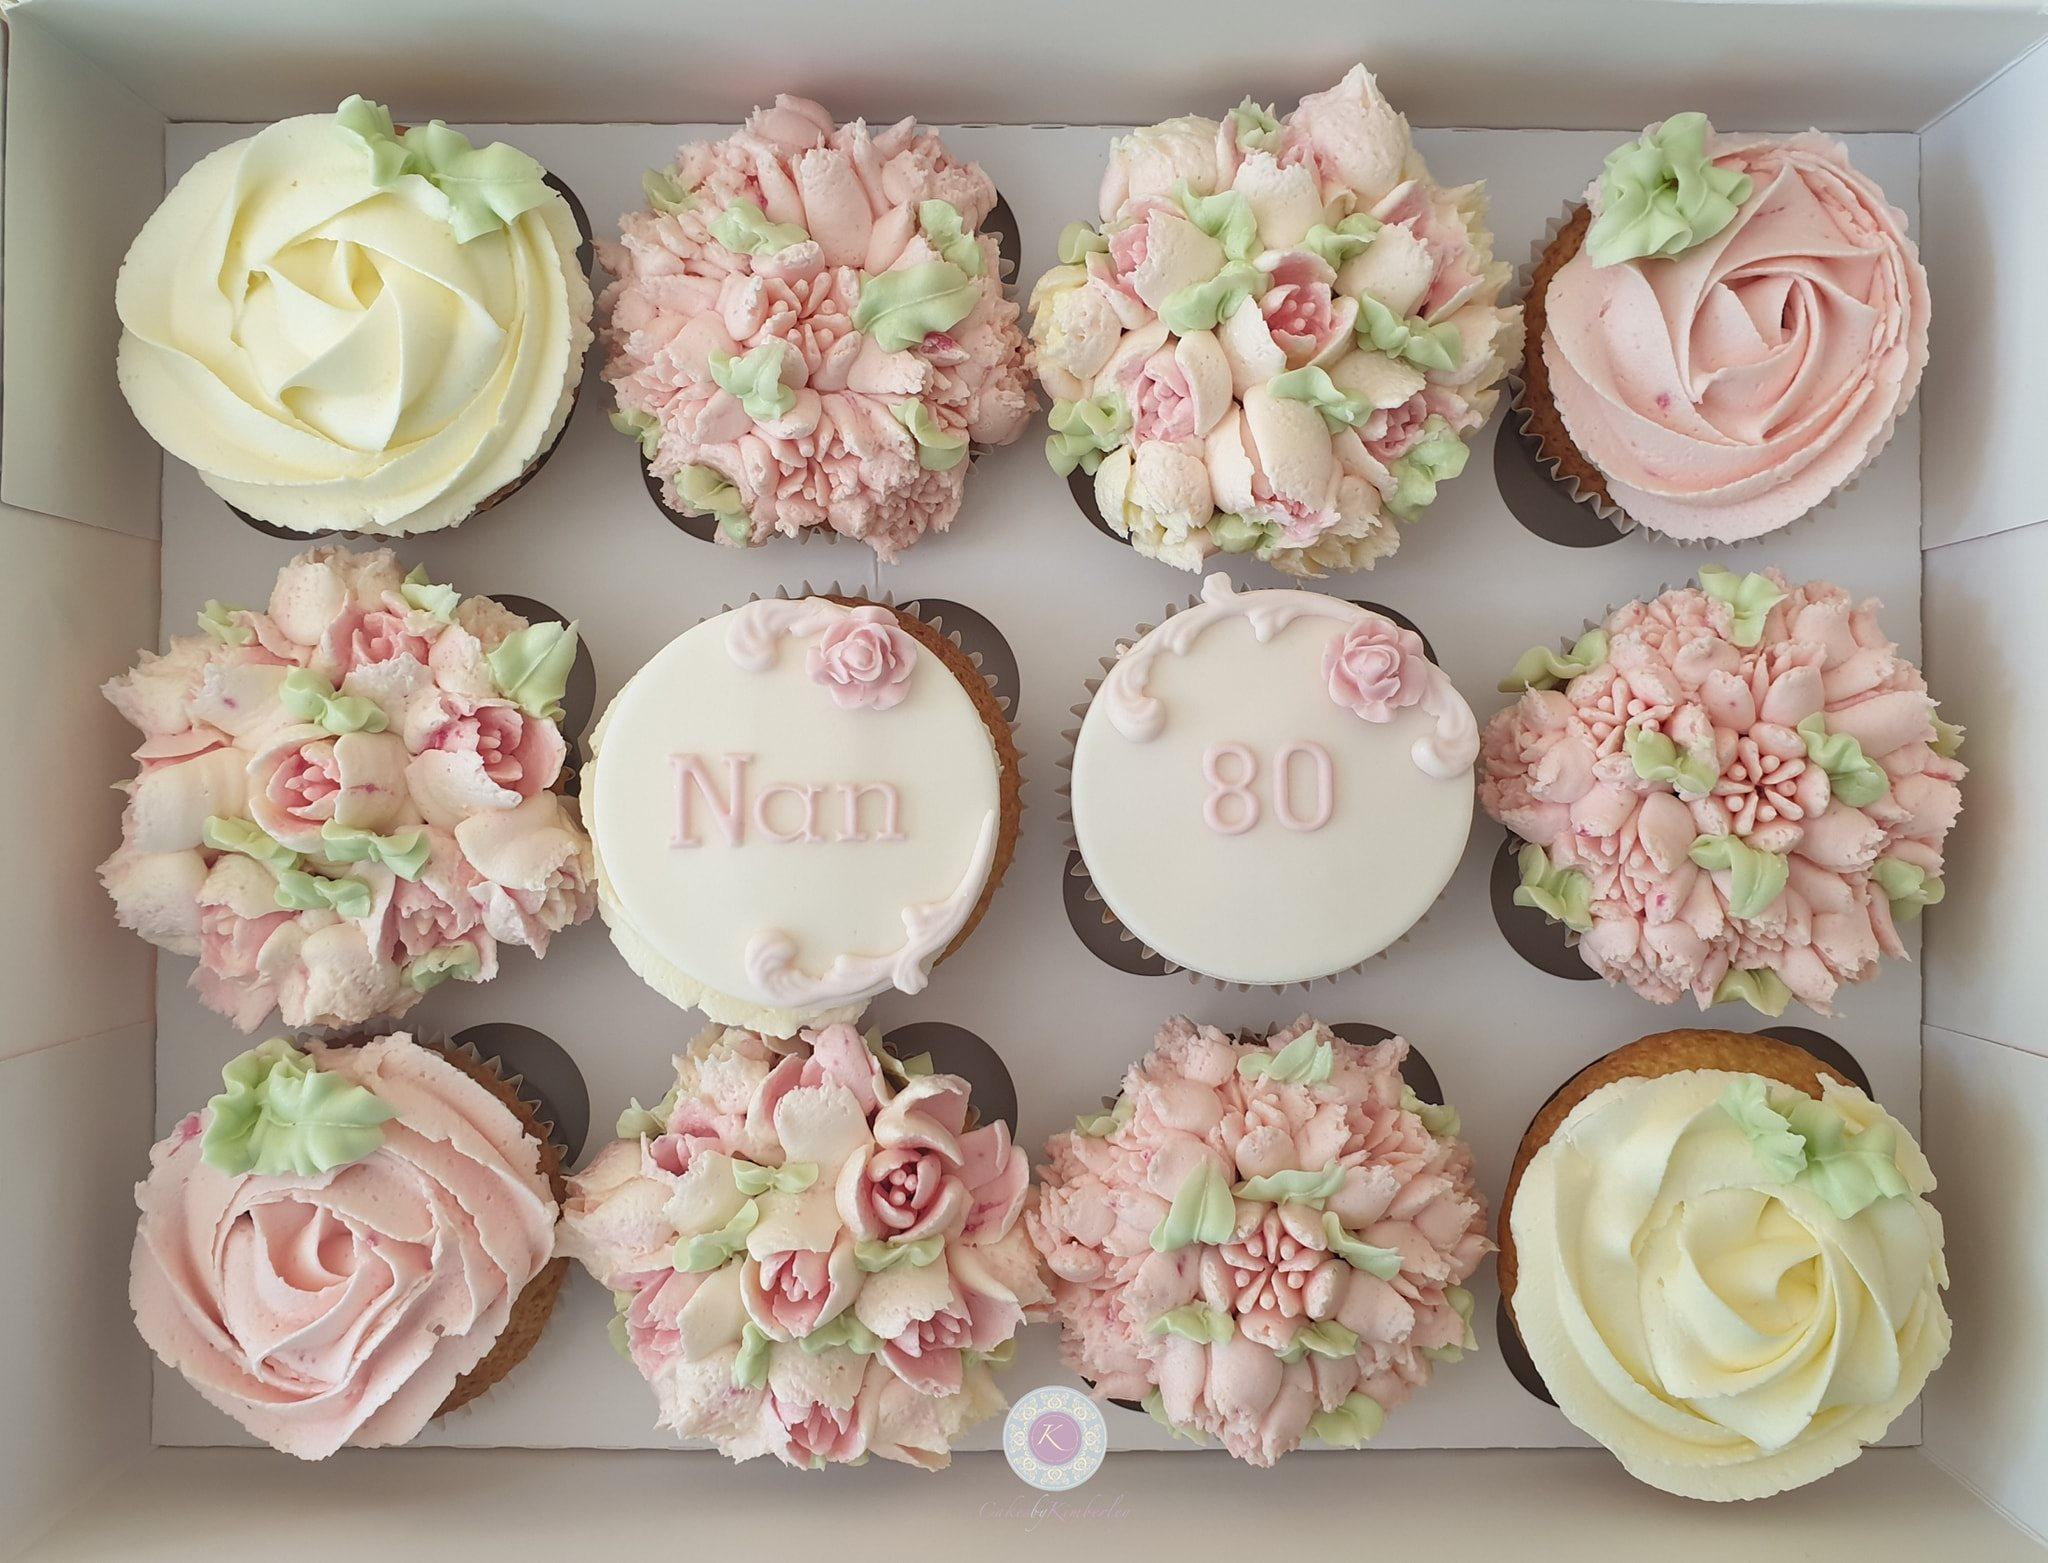 Cupcakes - Nan 90th flowers